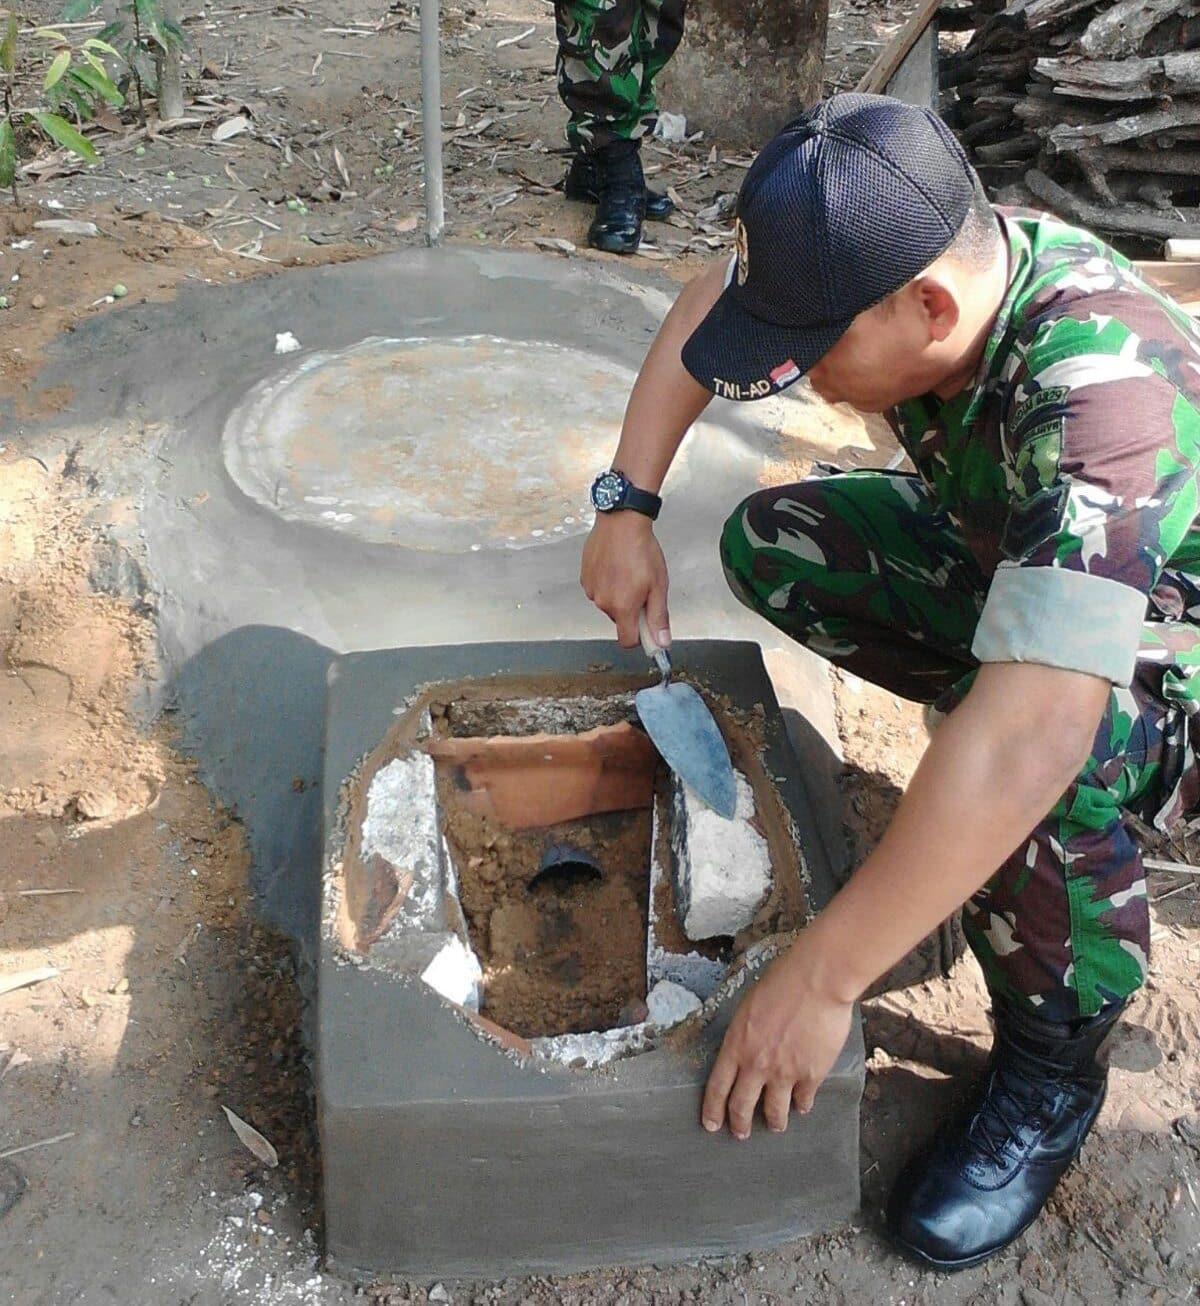 Kodim Bangkalan Lanjutkan Program Jambanisasi di 18 Kecamatan